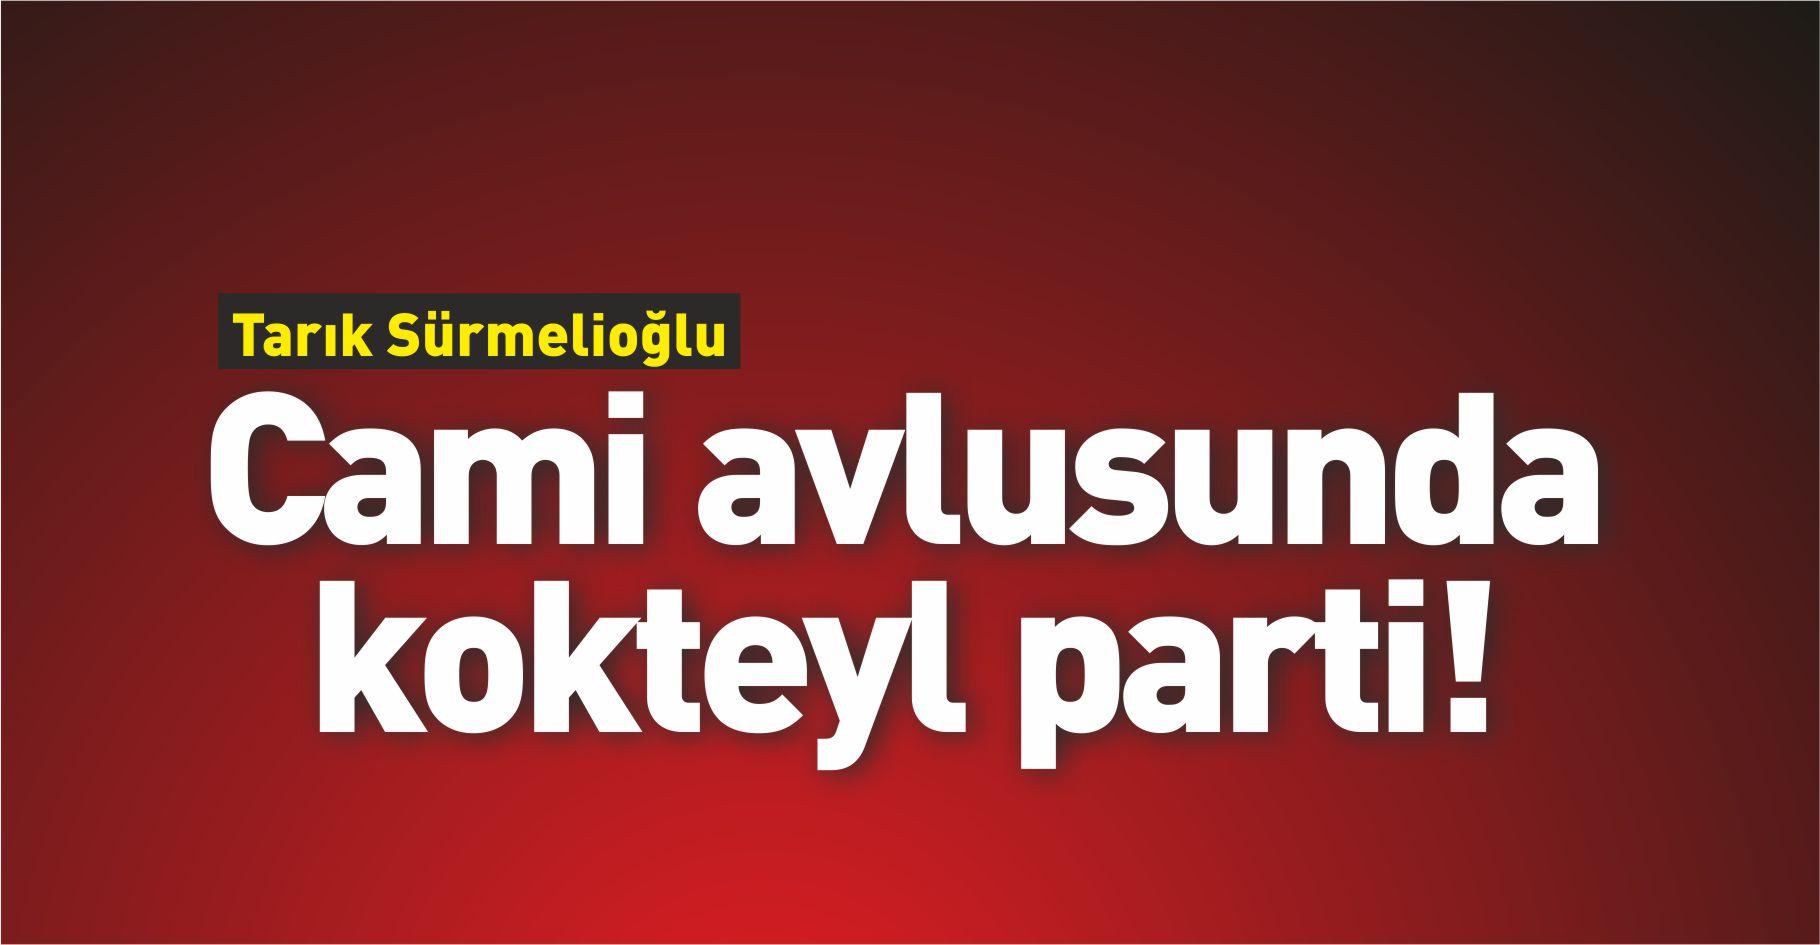 CAMİ AVLUSUNDA KOKTEYL PARTİ!